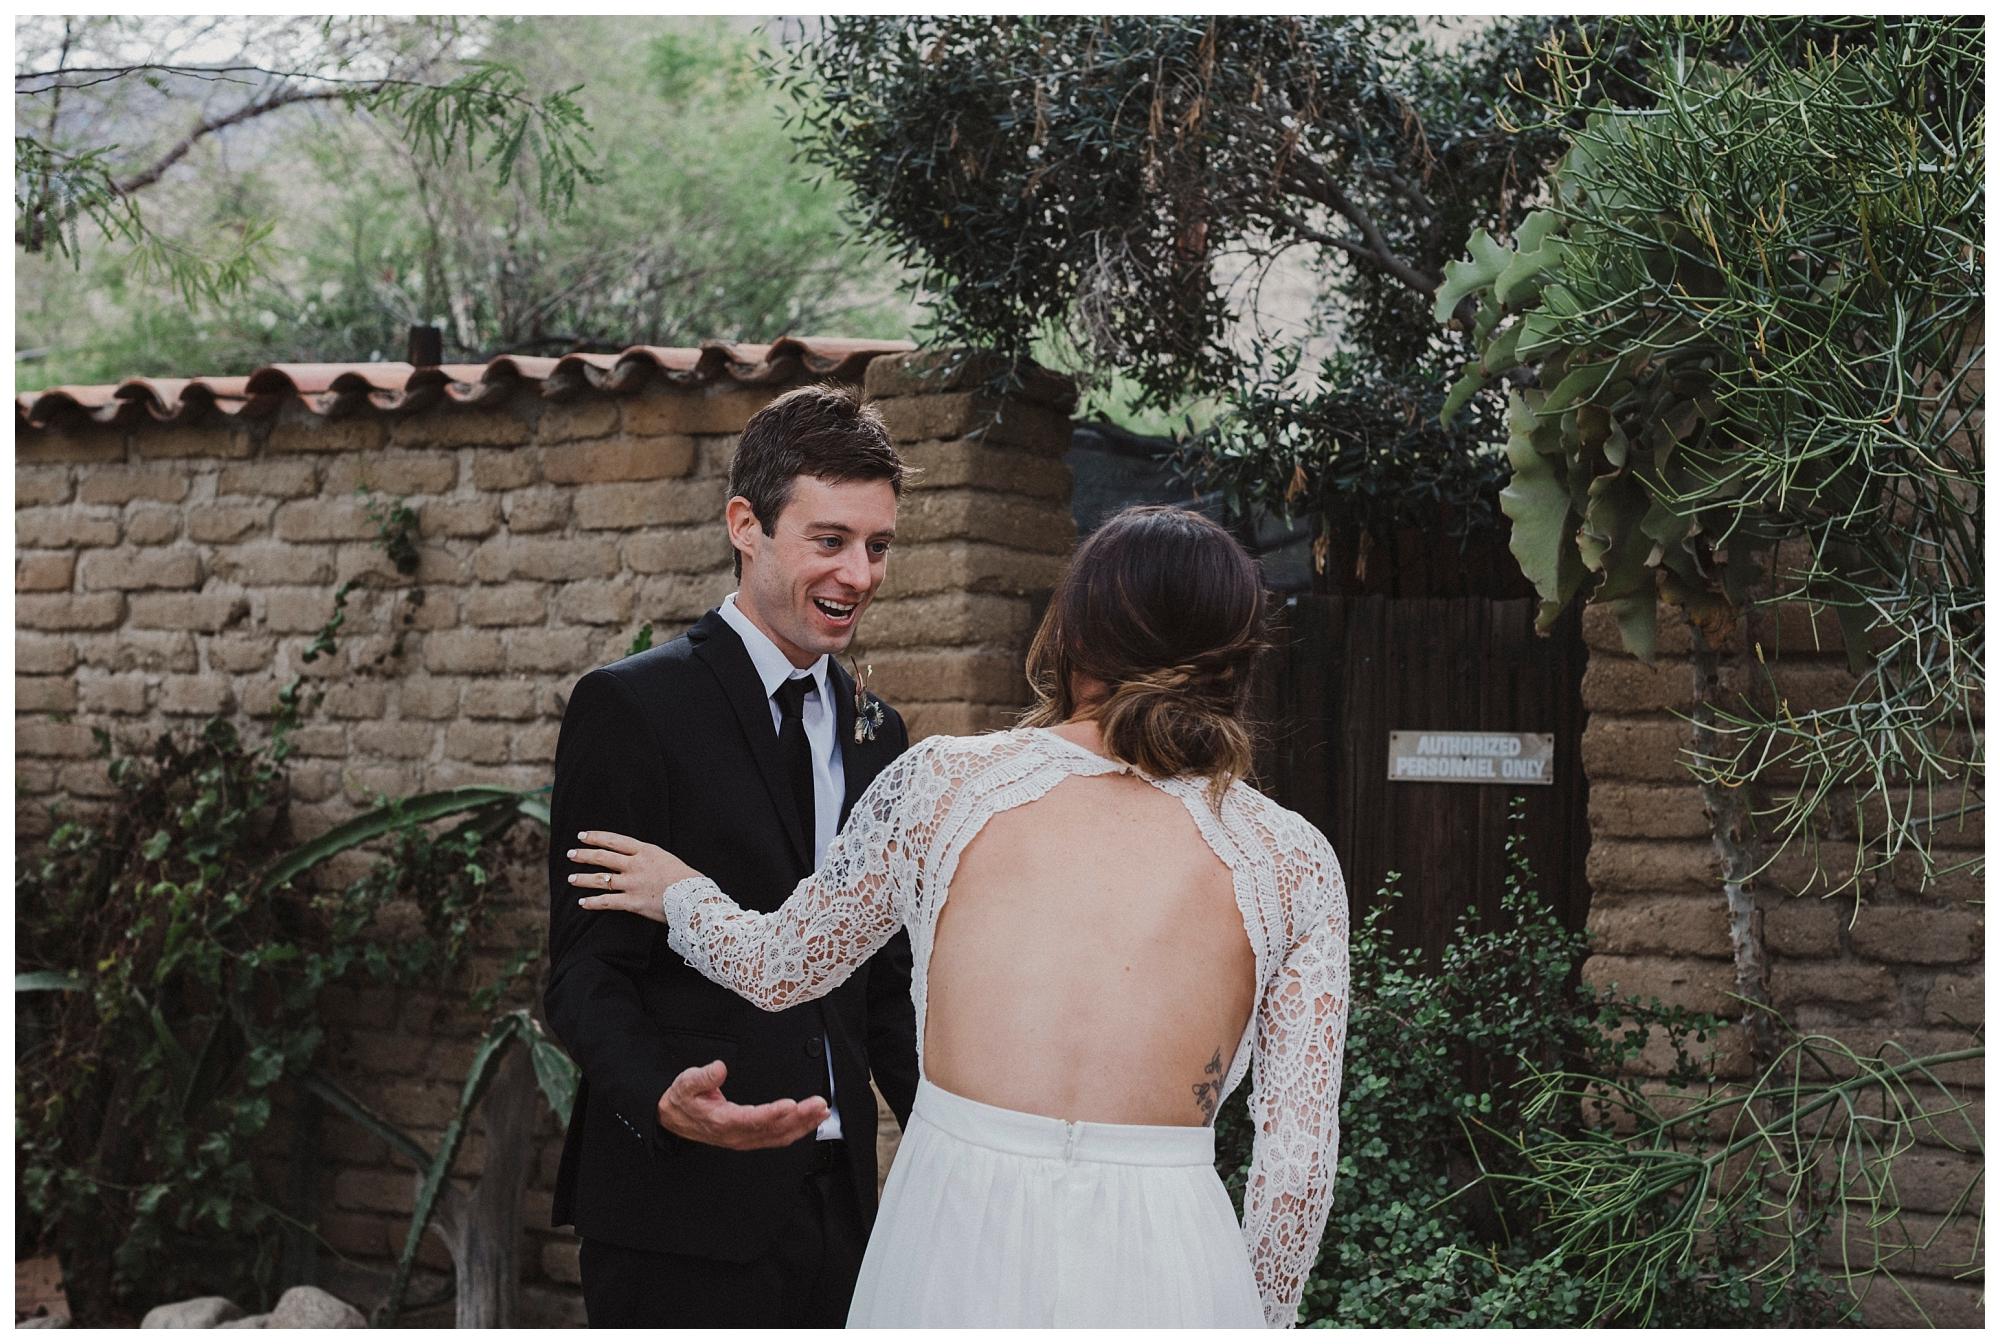 Ace Hotel Wedding Palm Springs (18).jpg